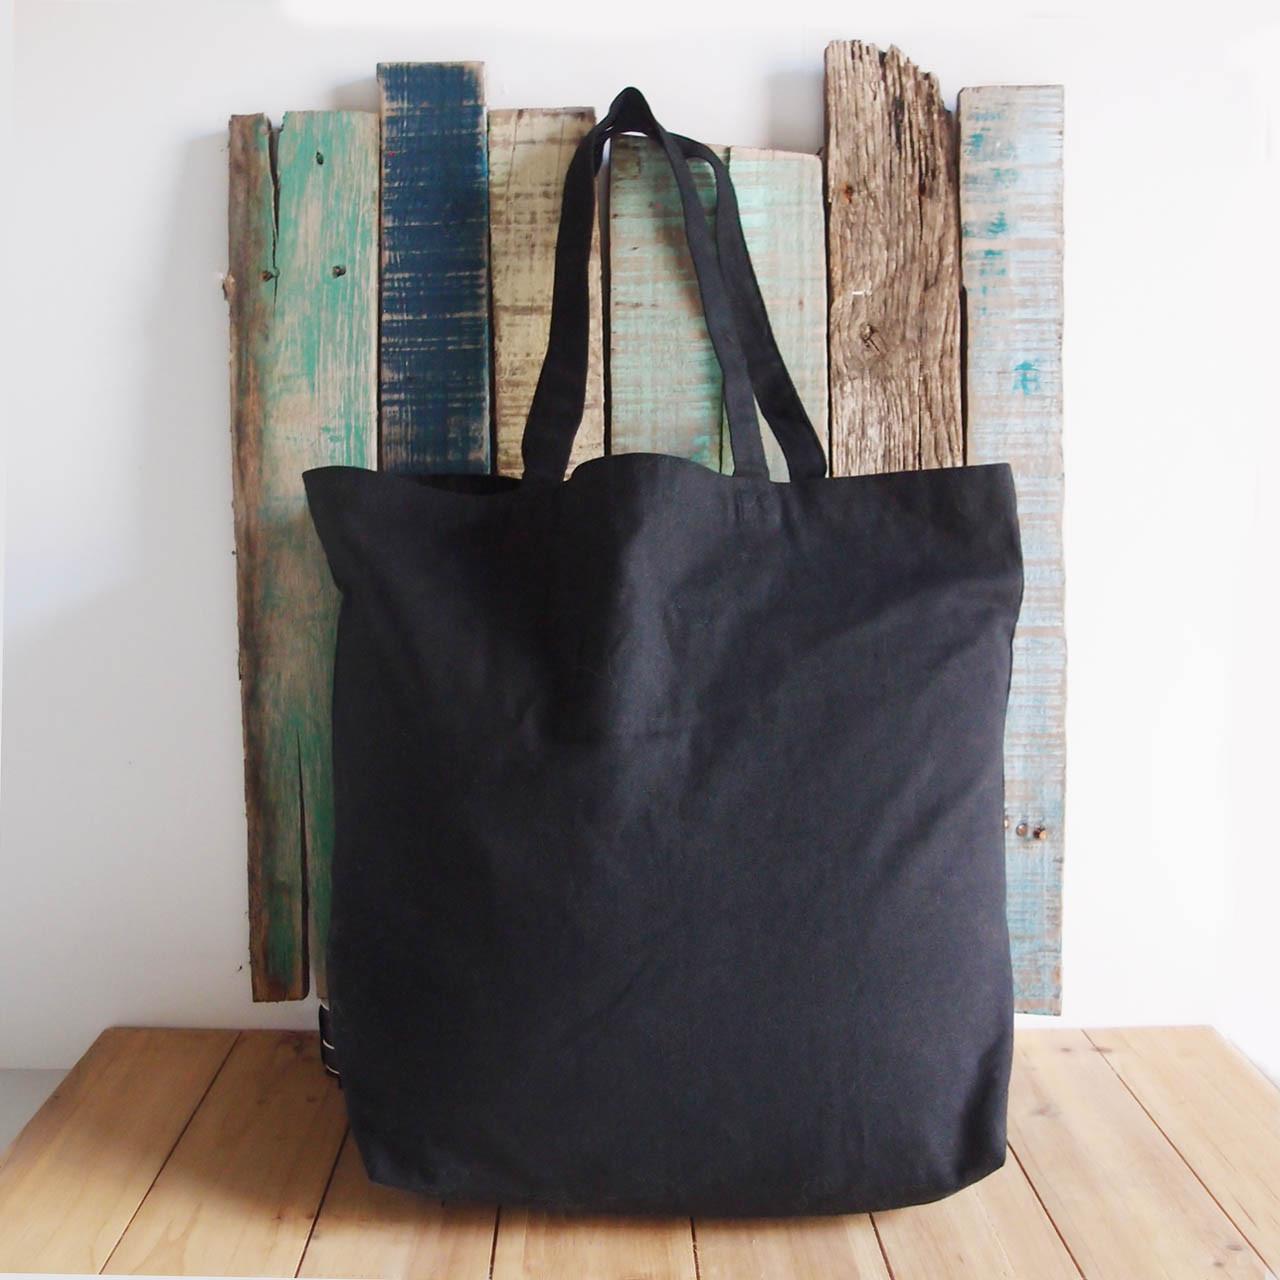 "Black Cotton Canvas Tote Bag 18"" W x 15"" H x 5.75"" Gusset"